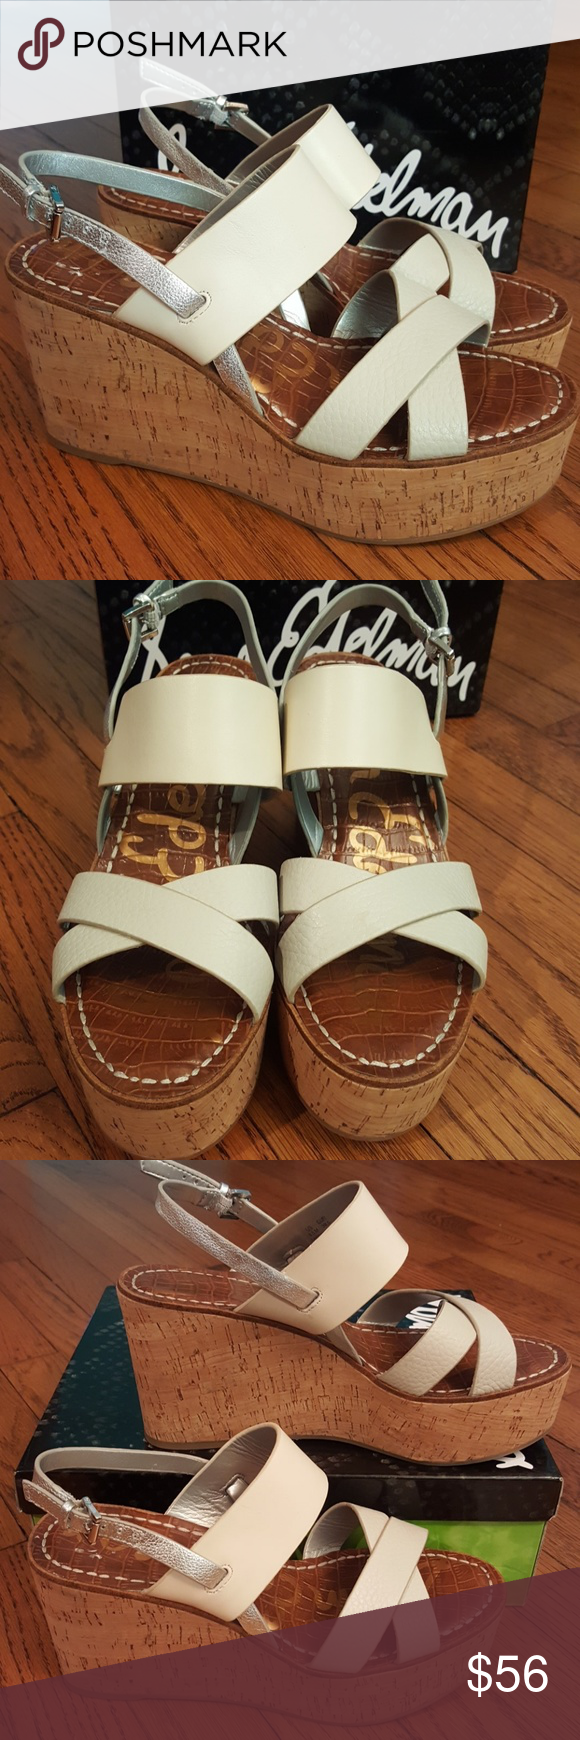 f4656c06115 New Sam Edelman Destiny Wedge Sandal Leather cork wedge sandals